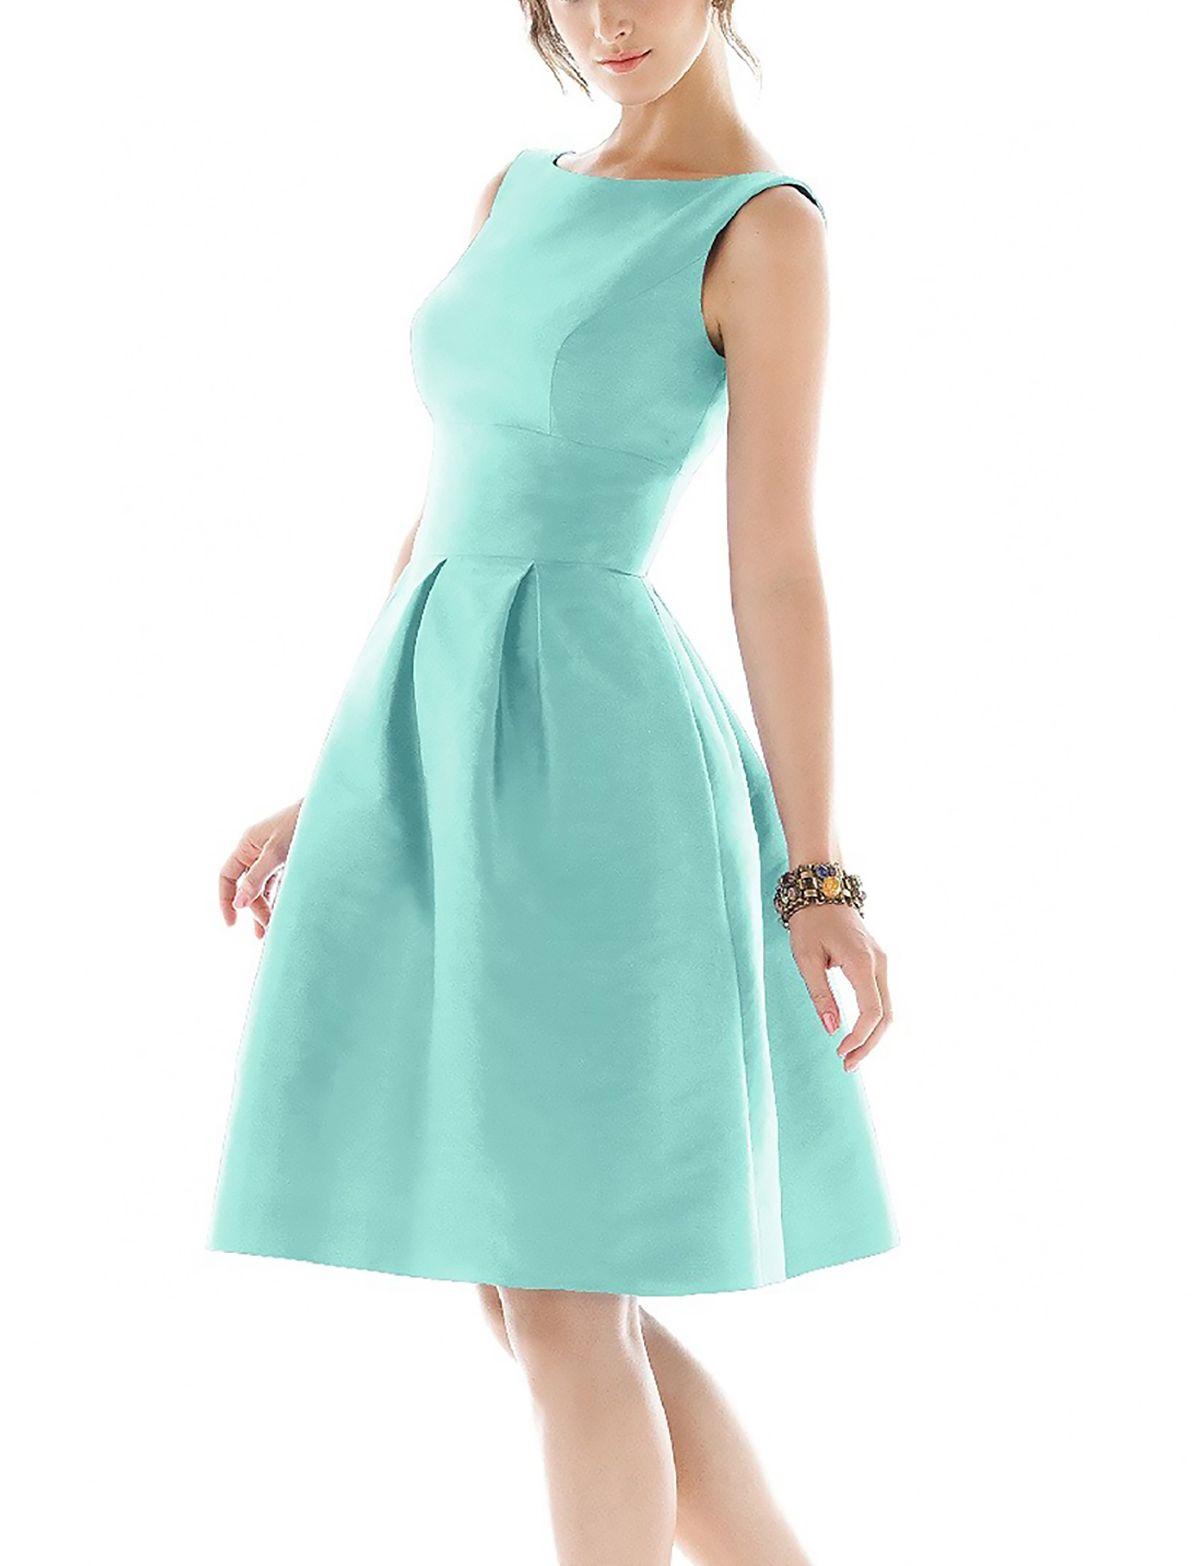 Knee Length Vintage Prom Dresses - Homecoming Prom Dresses